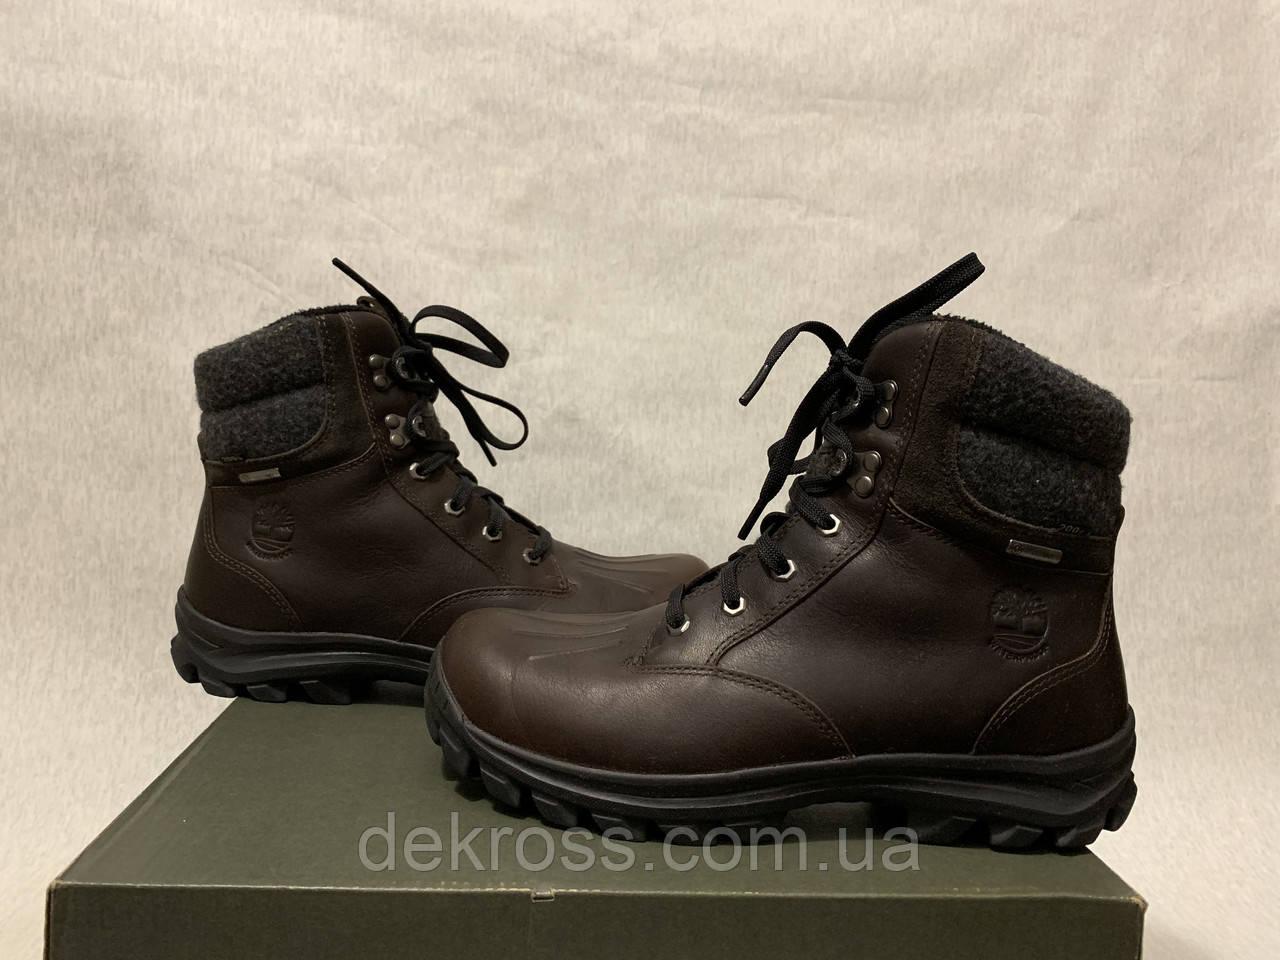 Ботинки Timberland (42.5) Оригинал